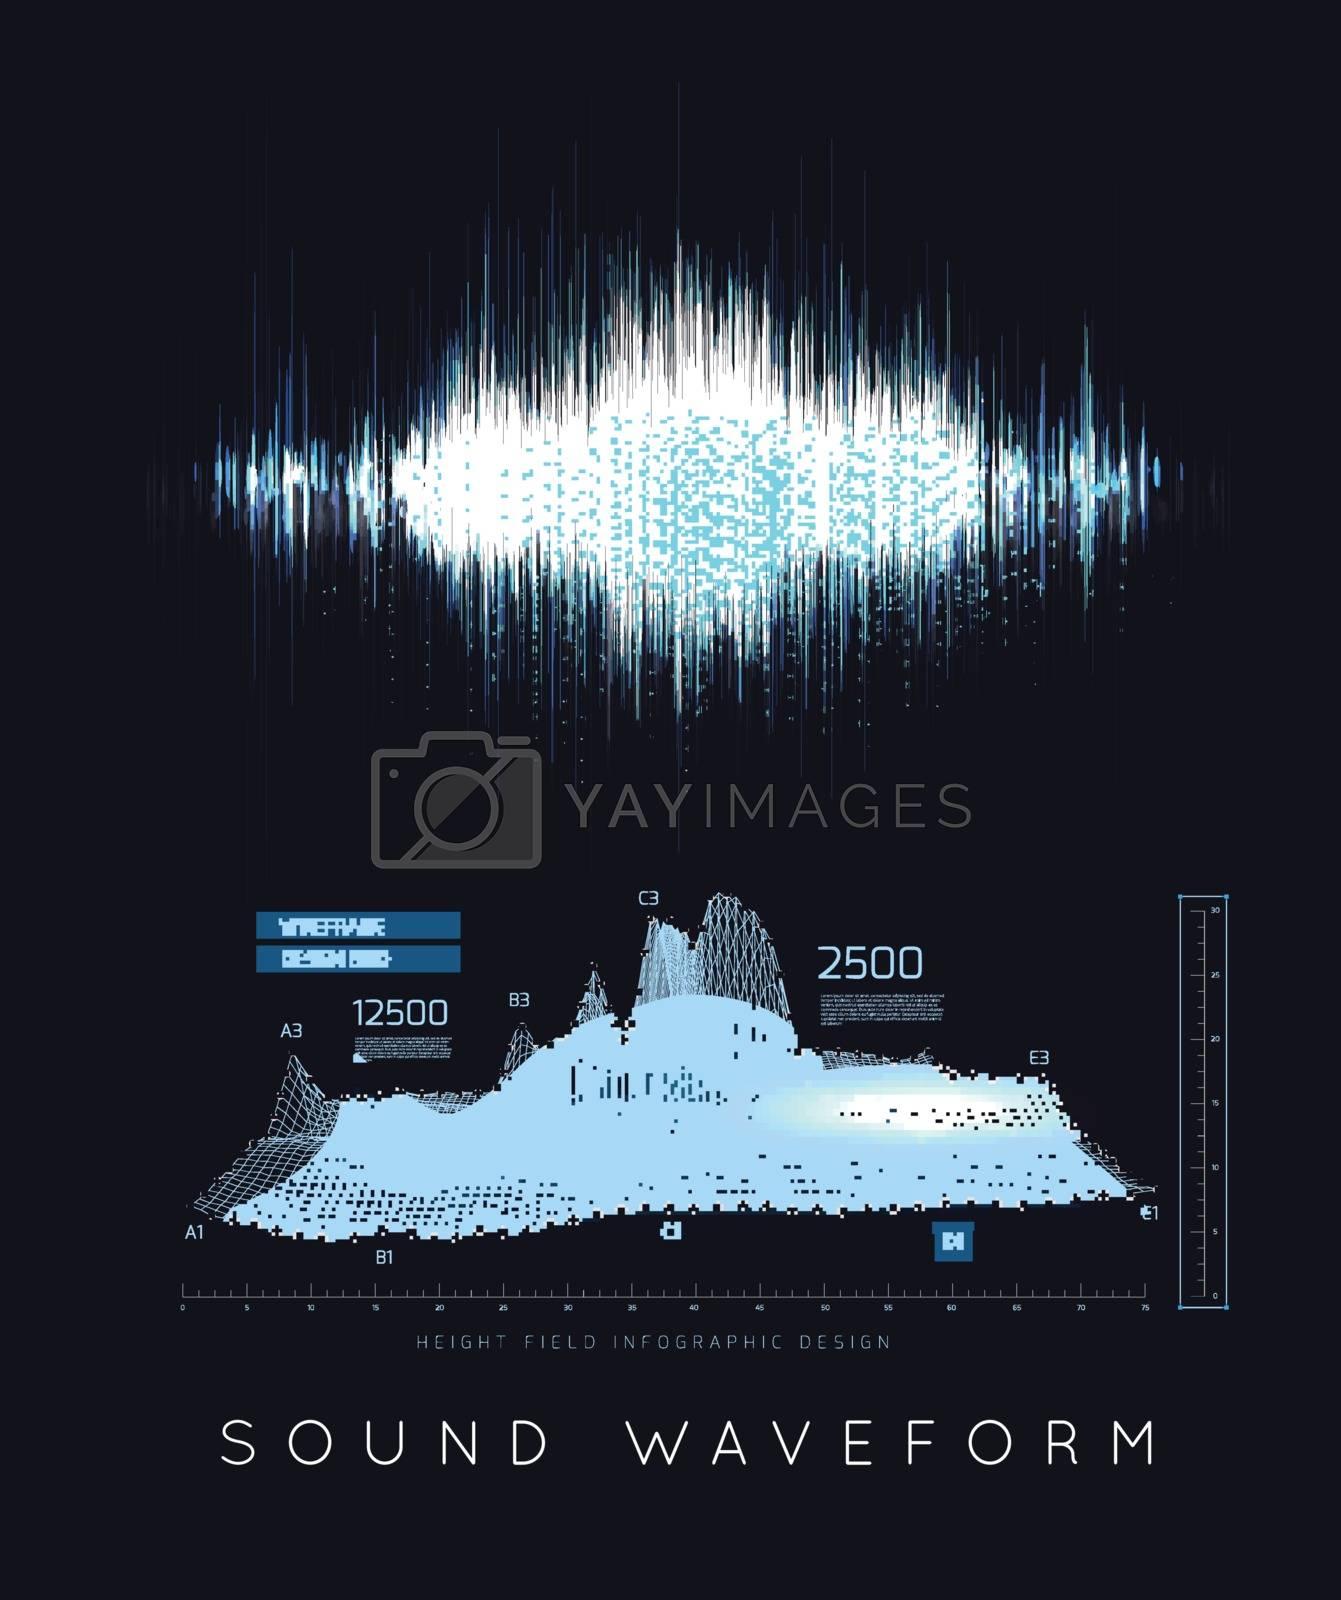 Graphic musical equalizer, sound waves, on a black background. Vector illustration